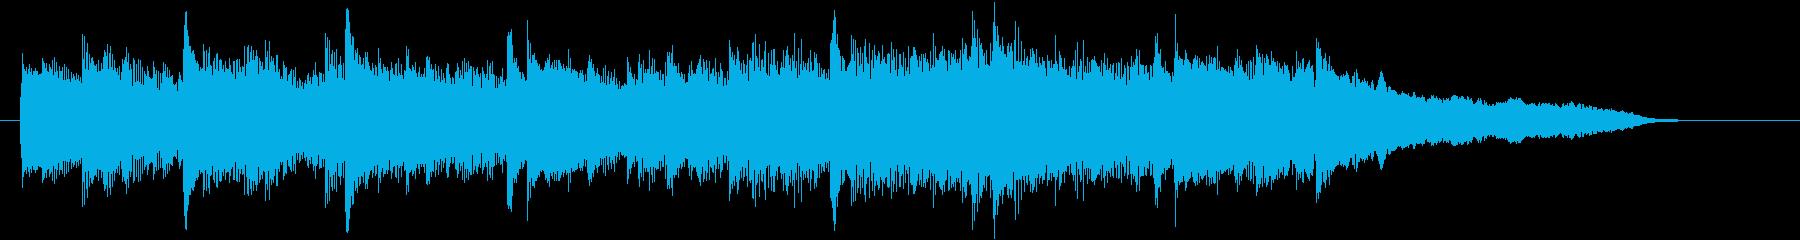 CM15秒、感動的なアコギとストリングスの再生済みの波形